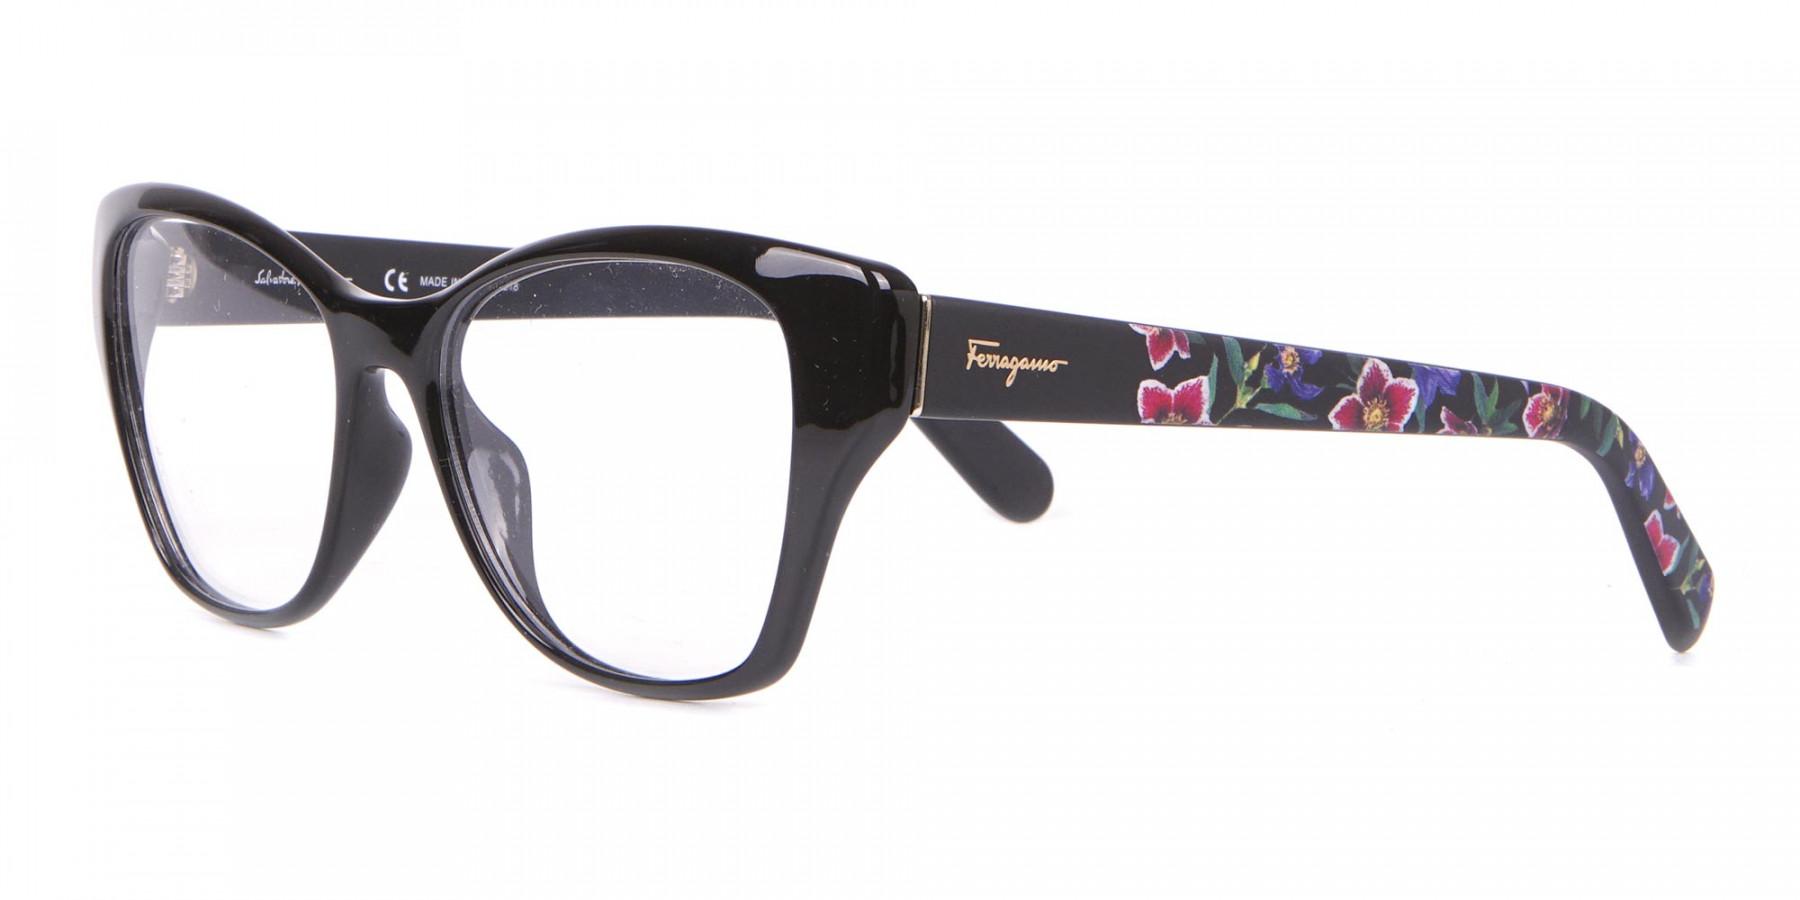 Salvatore Ferragamo SF2827 Cateye Wayfarer Glasses Black-1